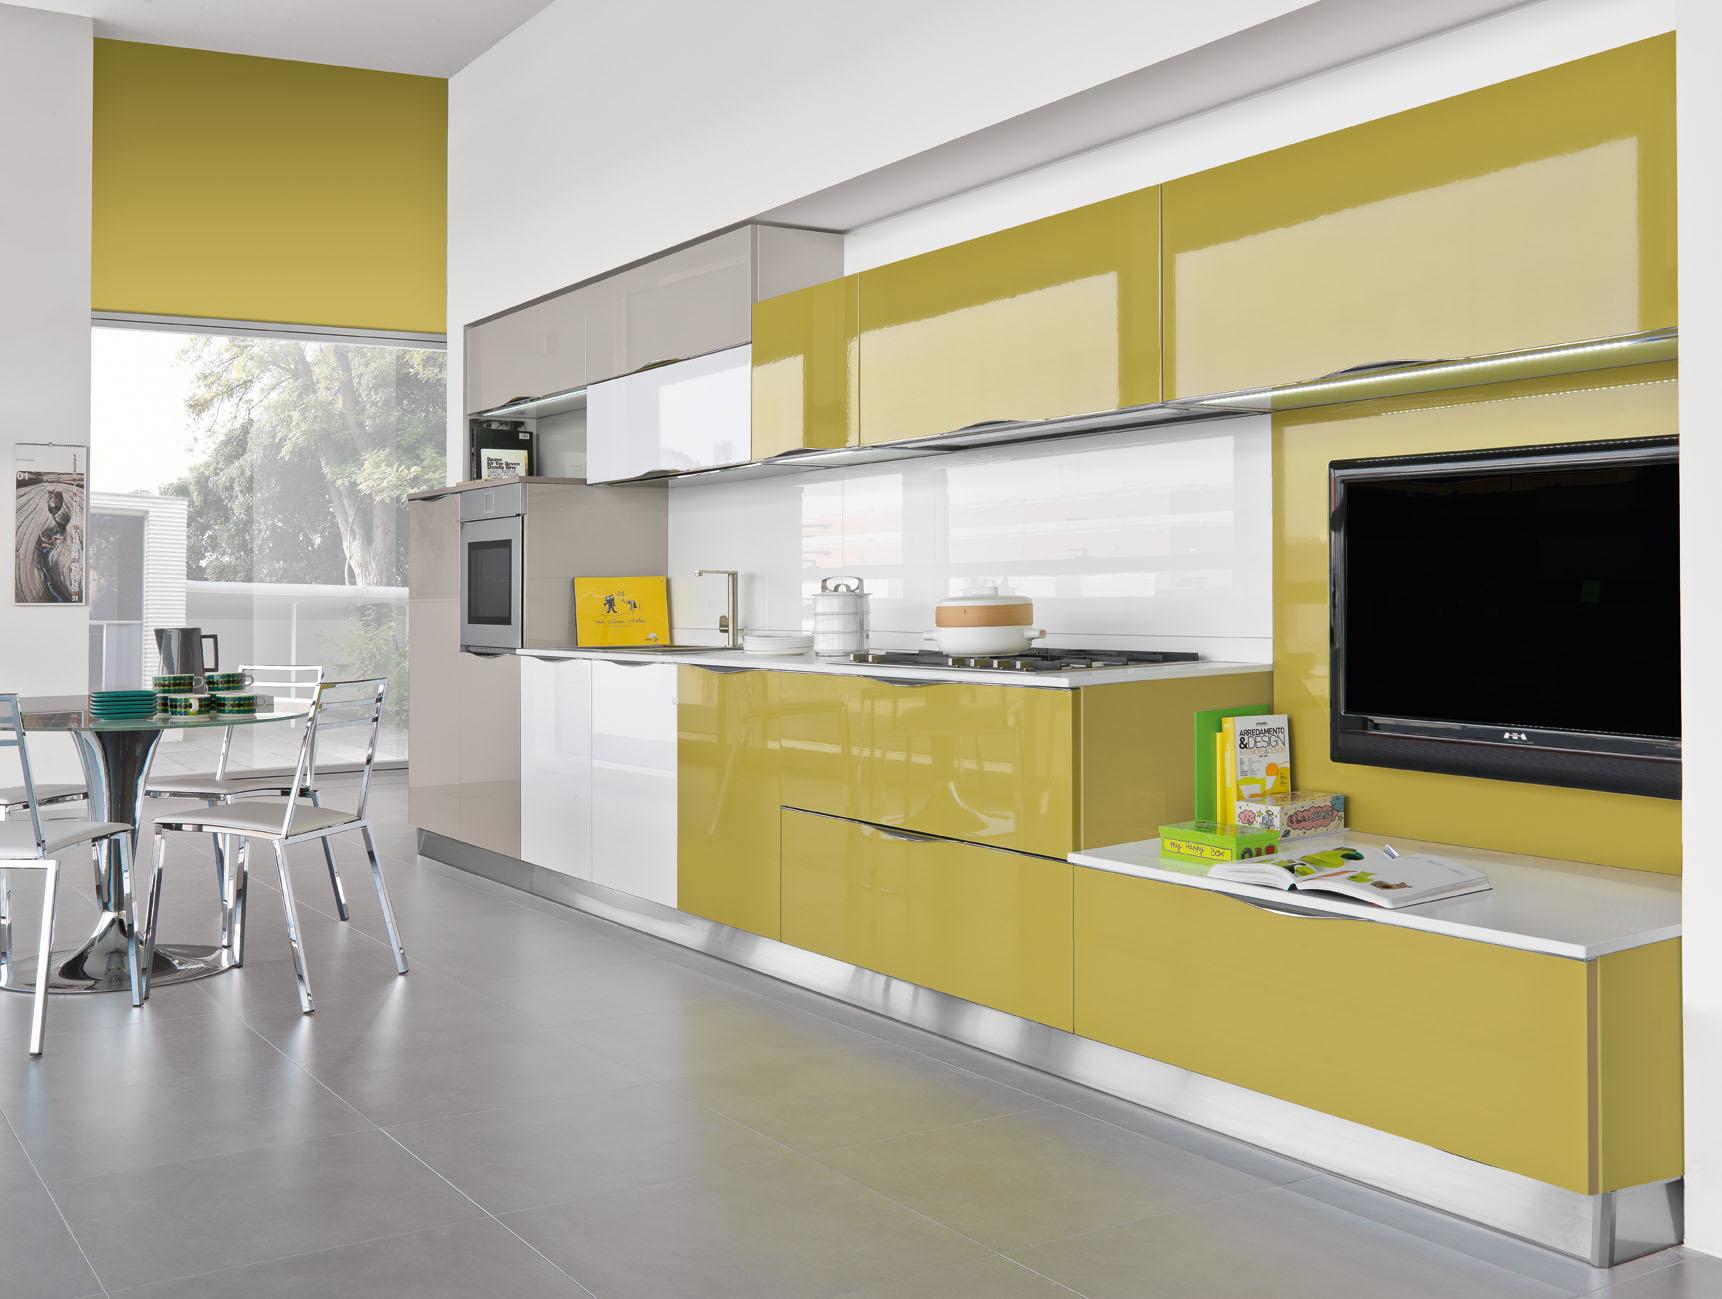 Mobili Cucina Giallo.Cucine Moderne Abitare Srl